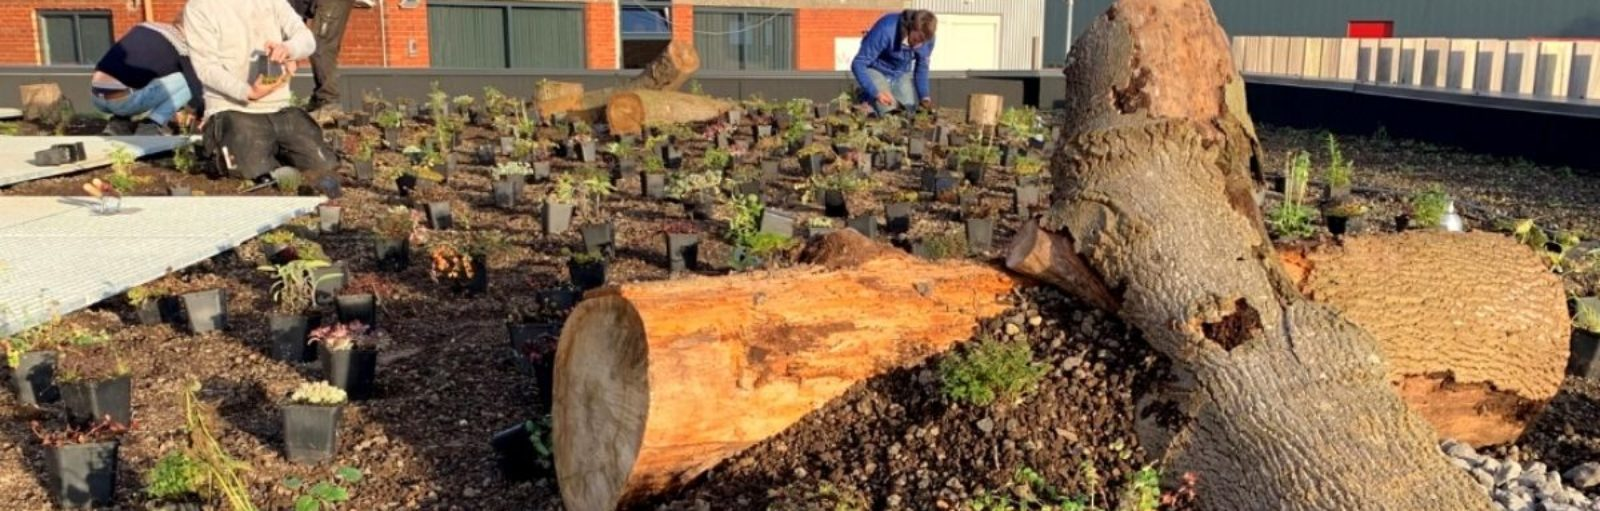 beplanting groendak